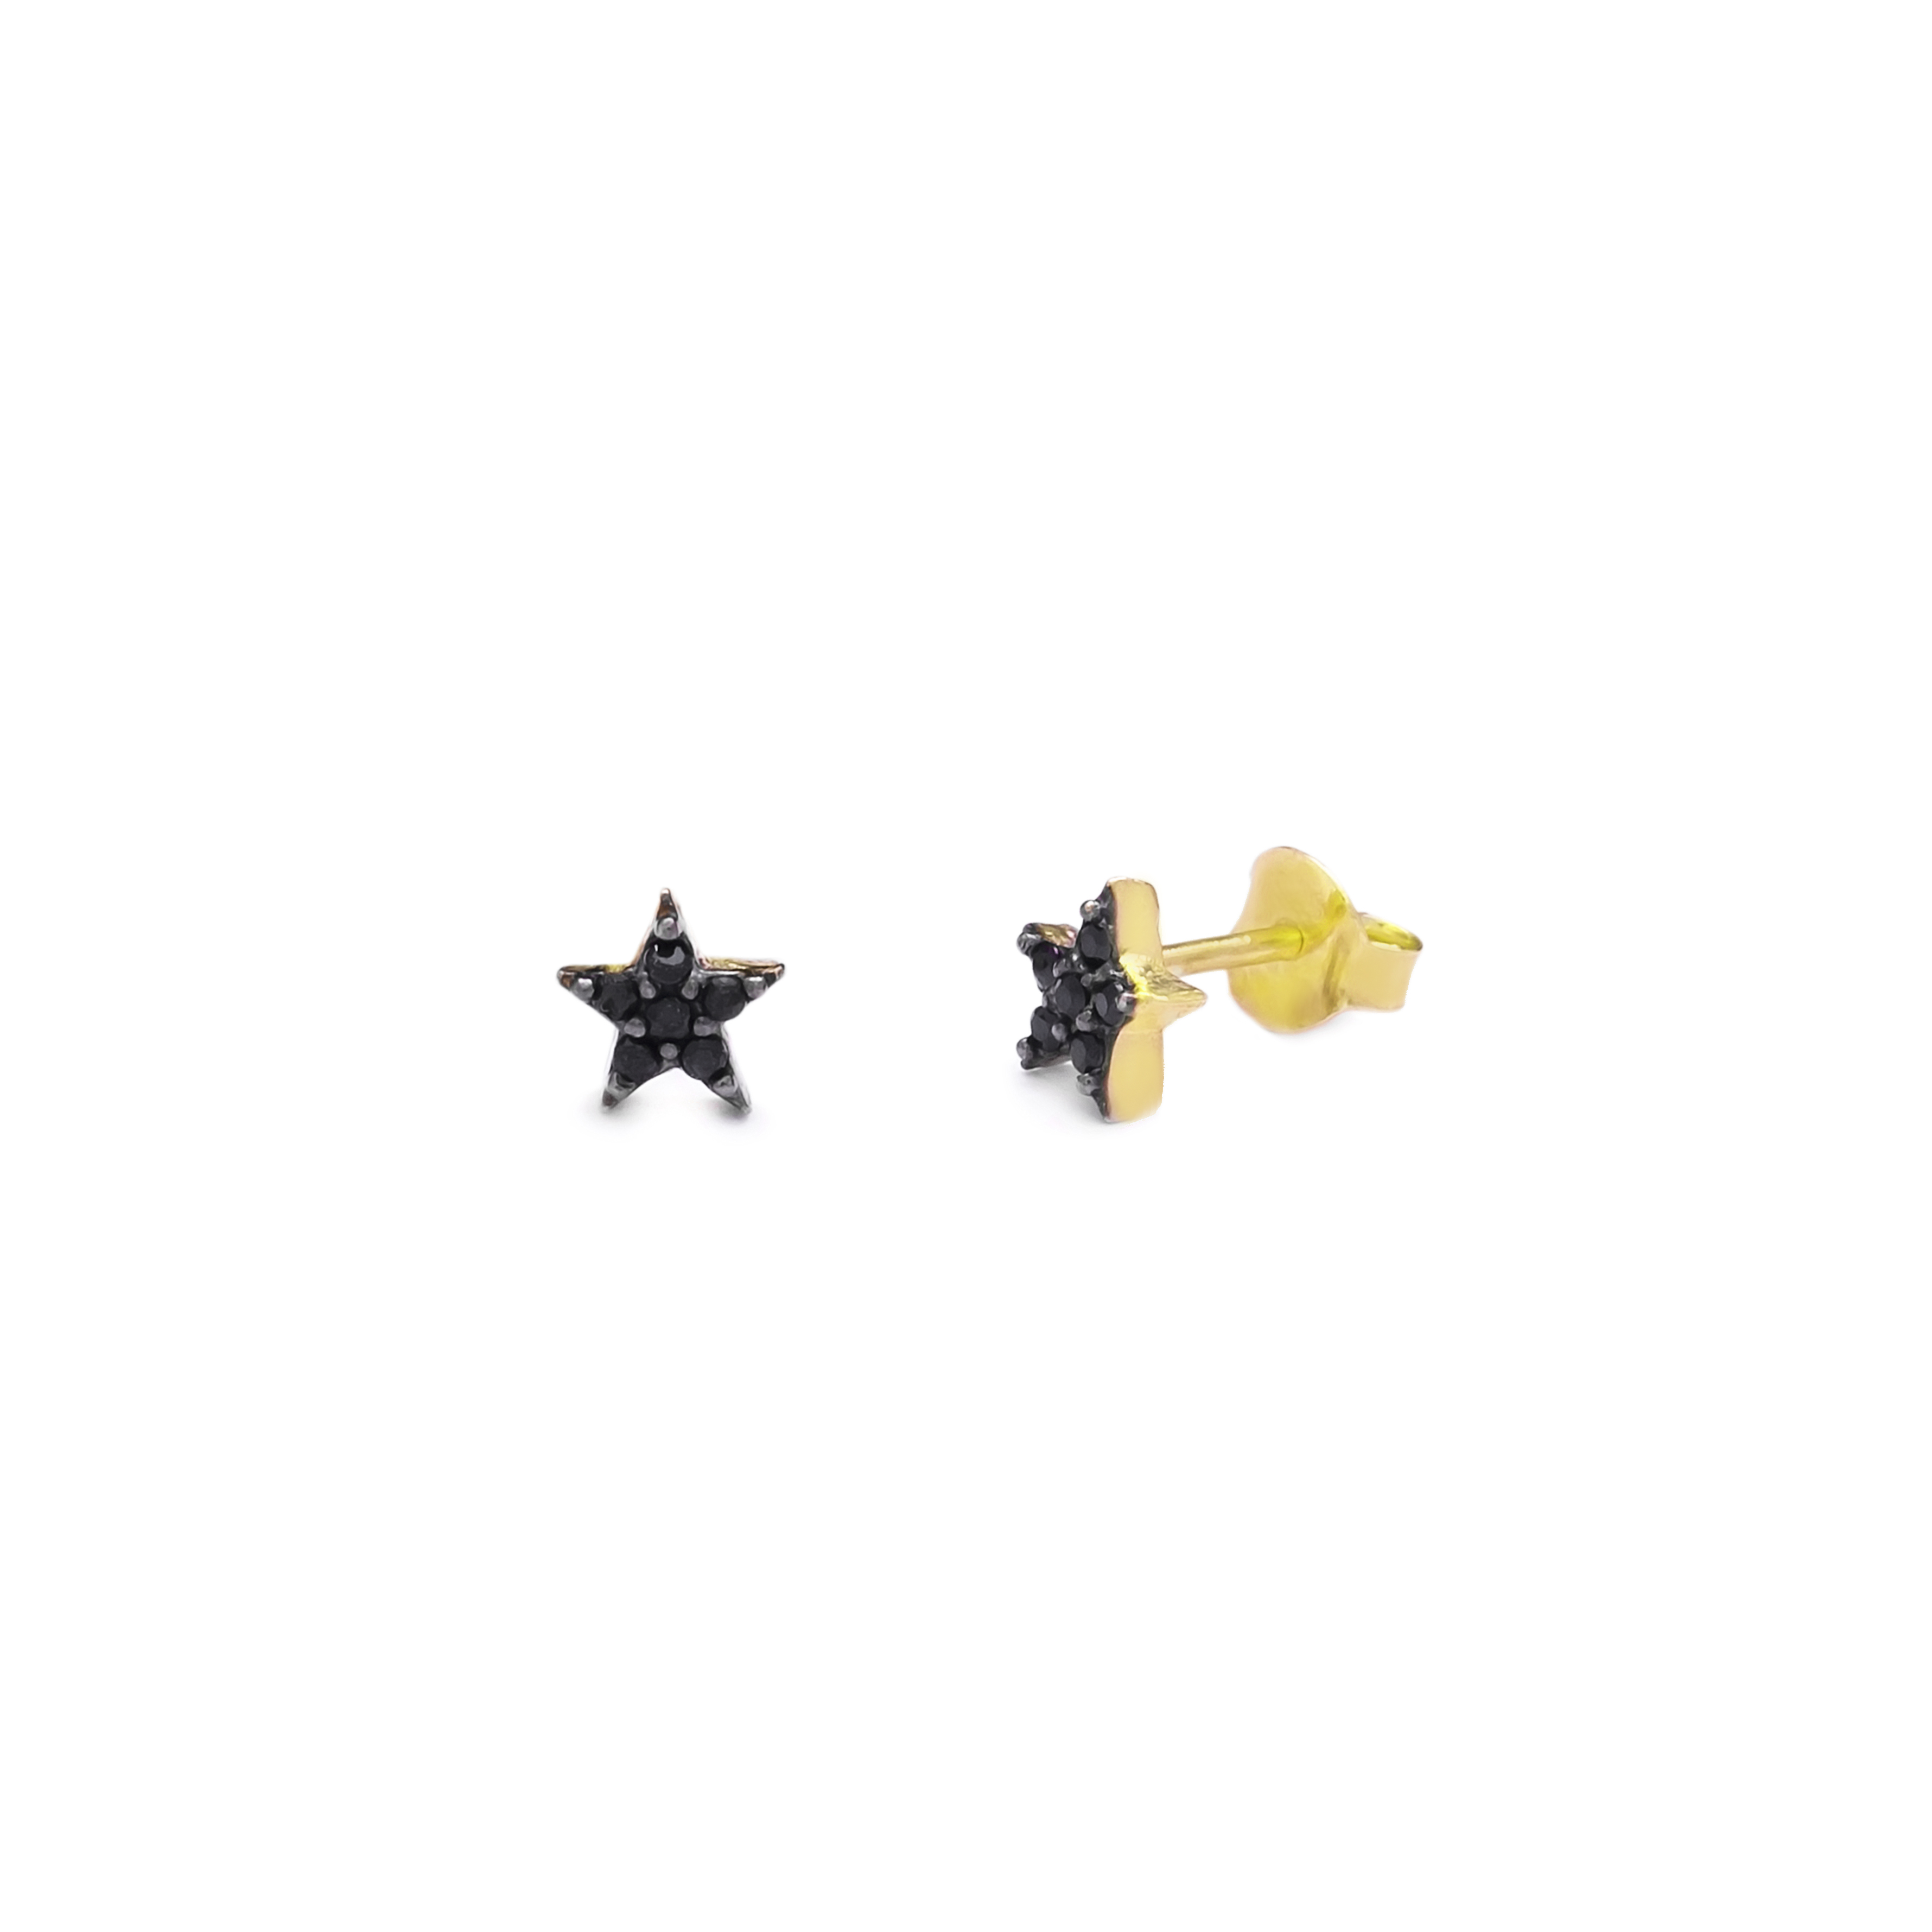 Single Star Earrings Black - Yellow Gold